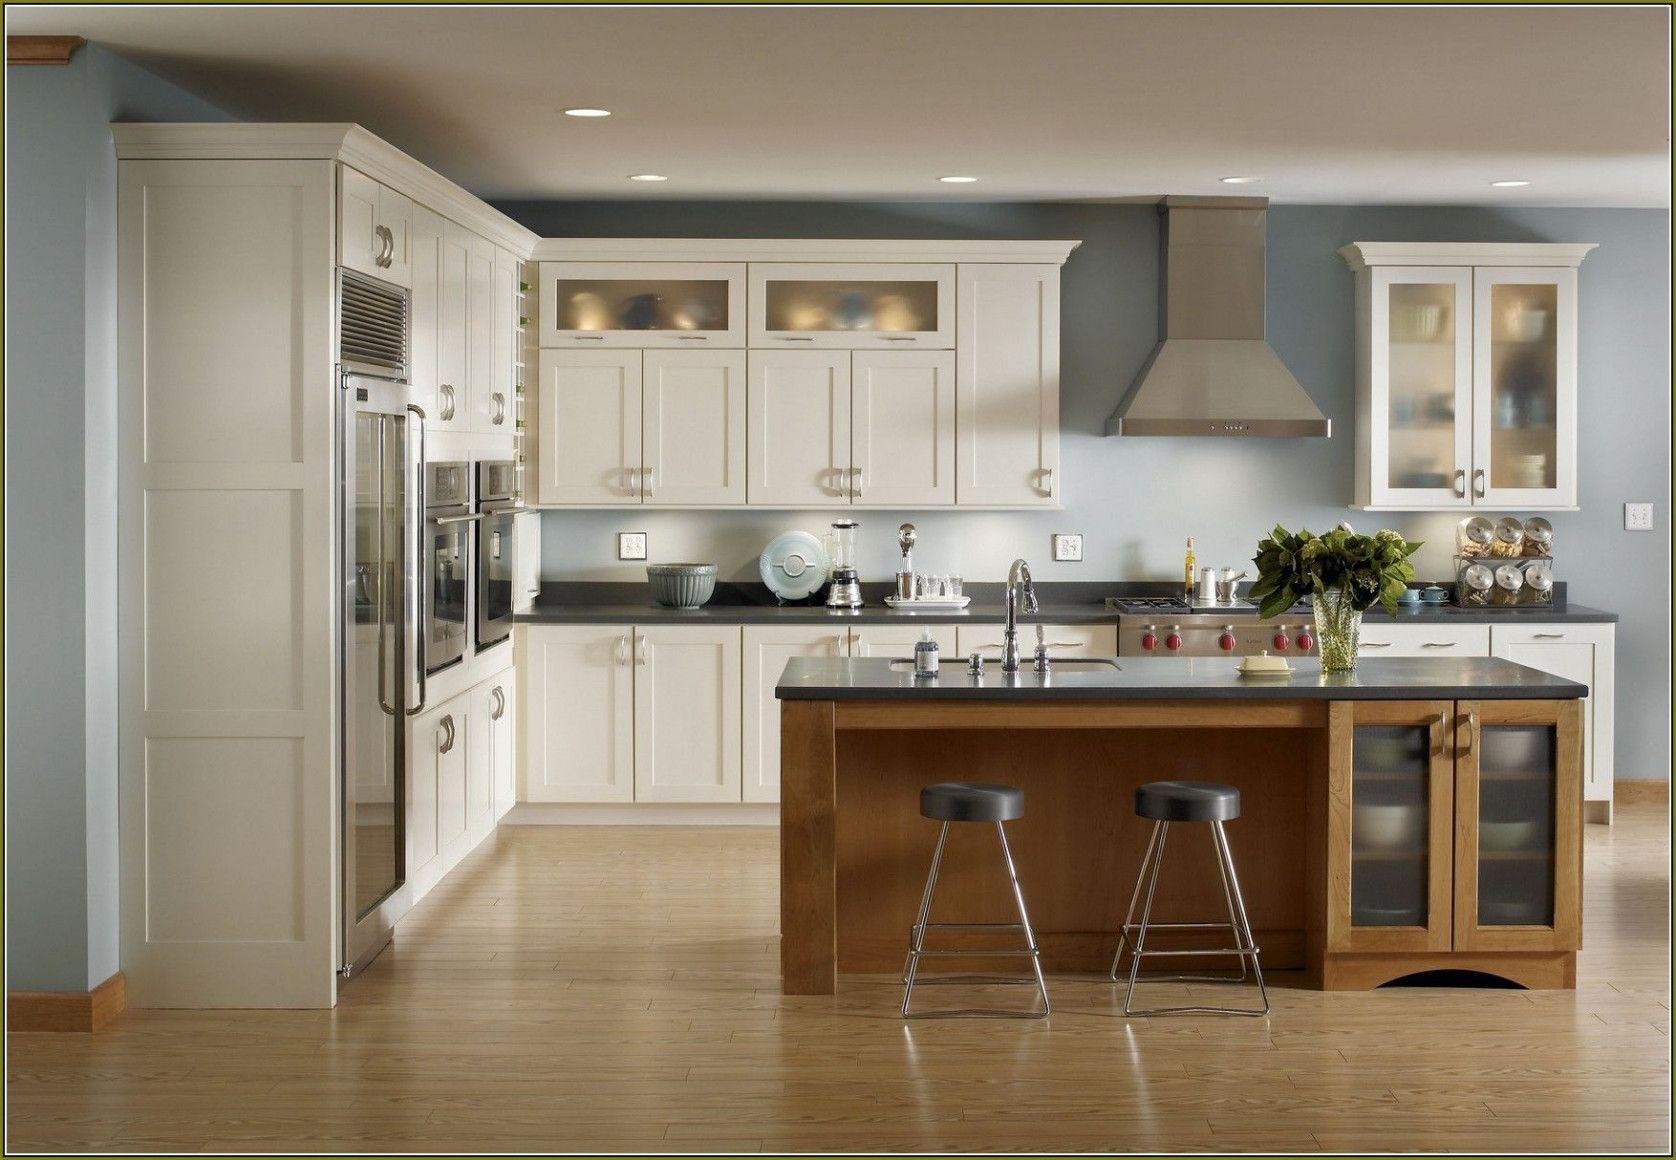 Fullsize Of Kitchen Decor Theme